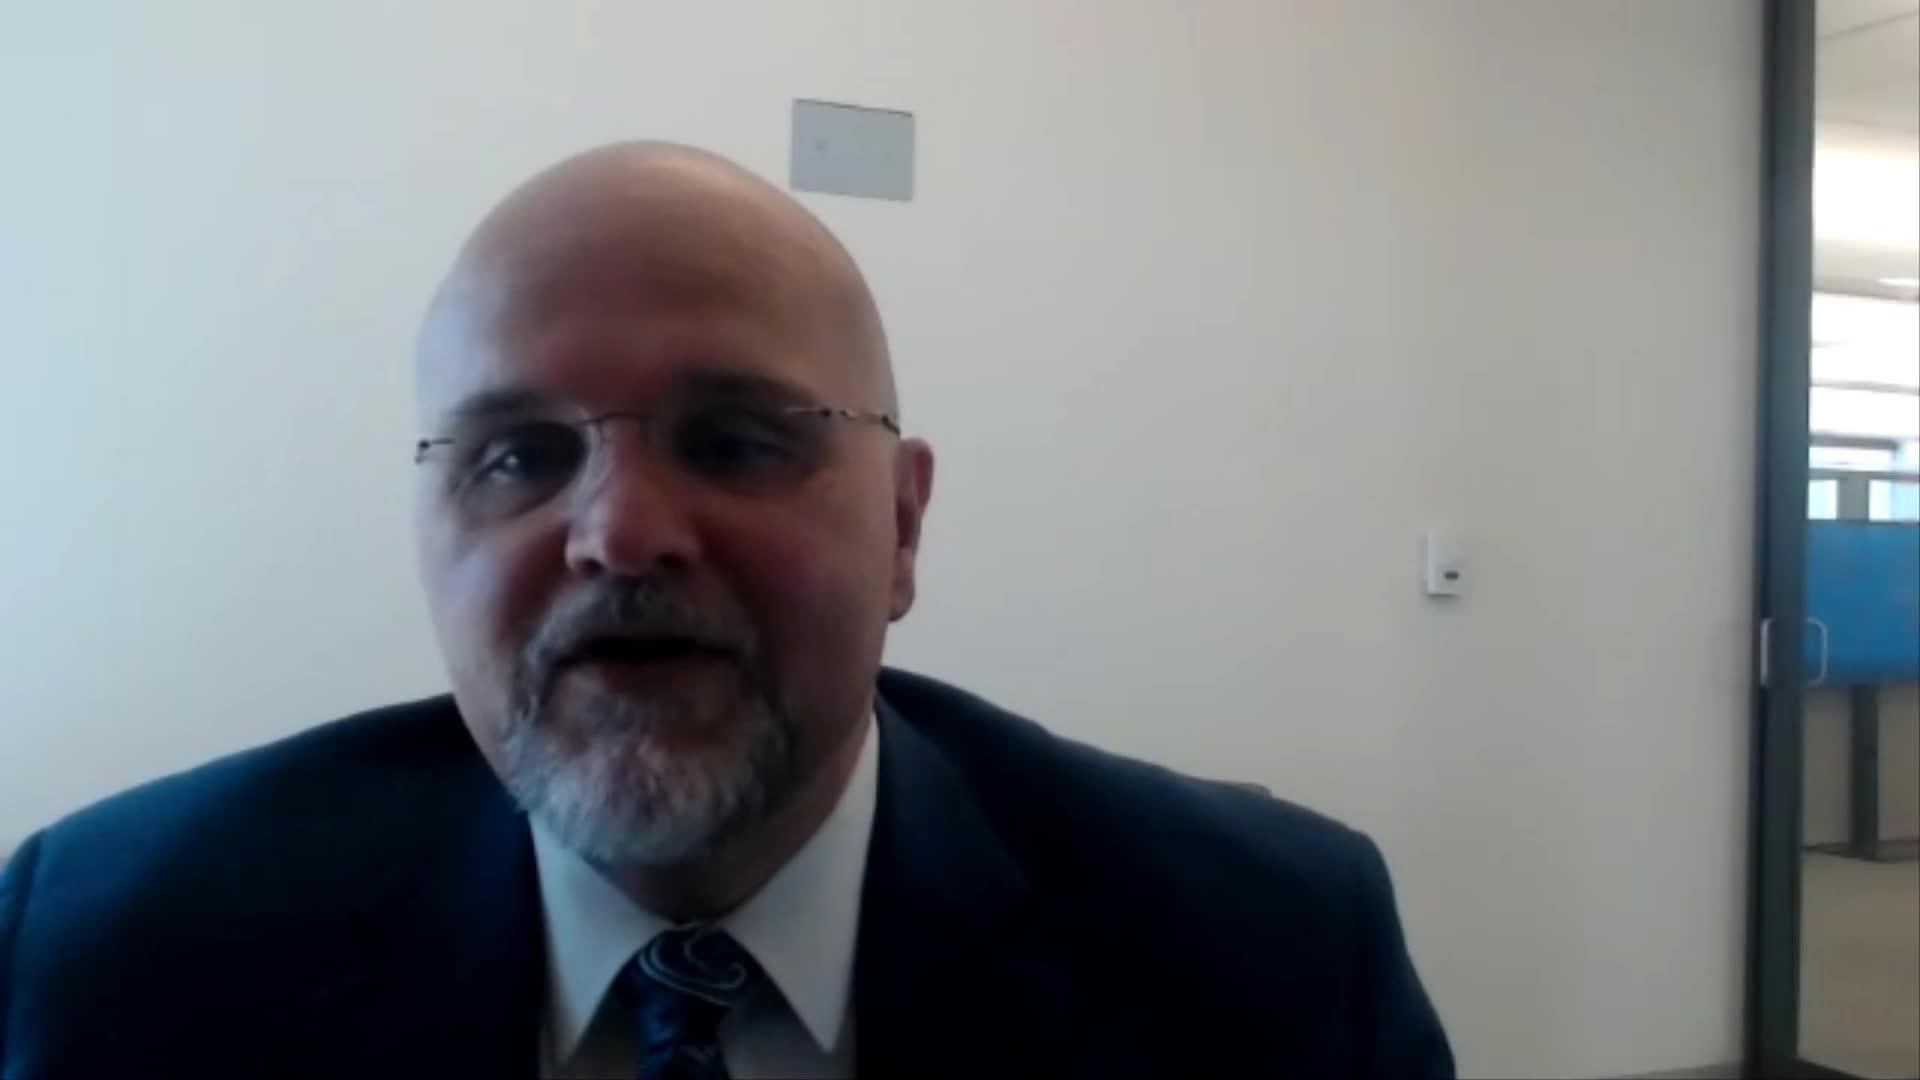 Dr. Scott J. Sherwood